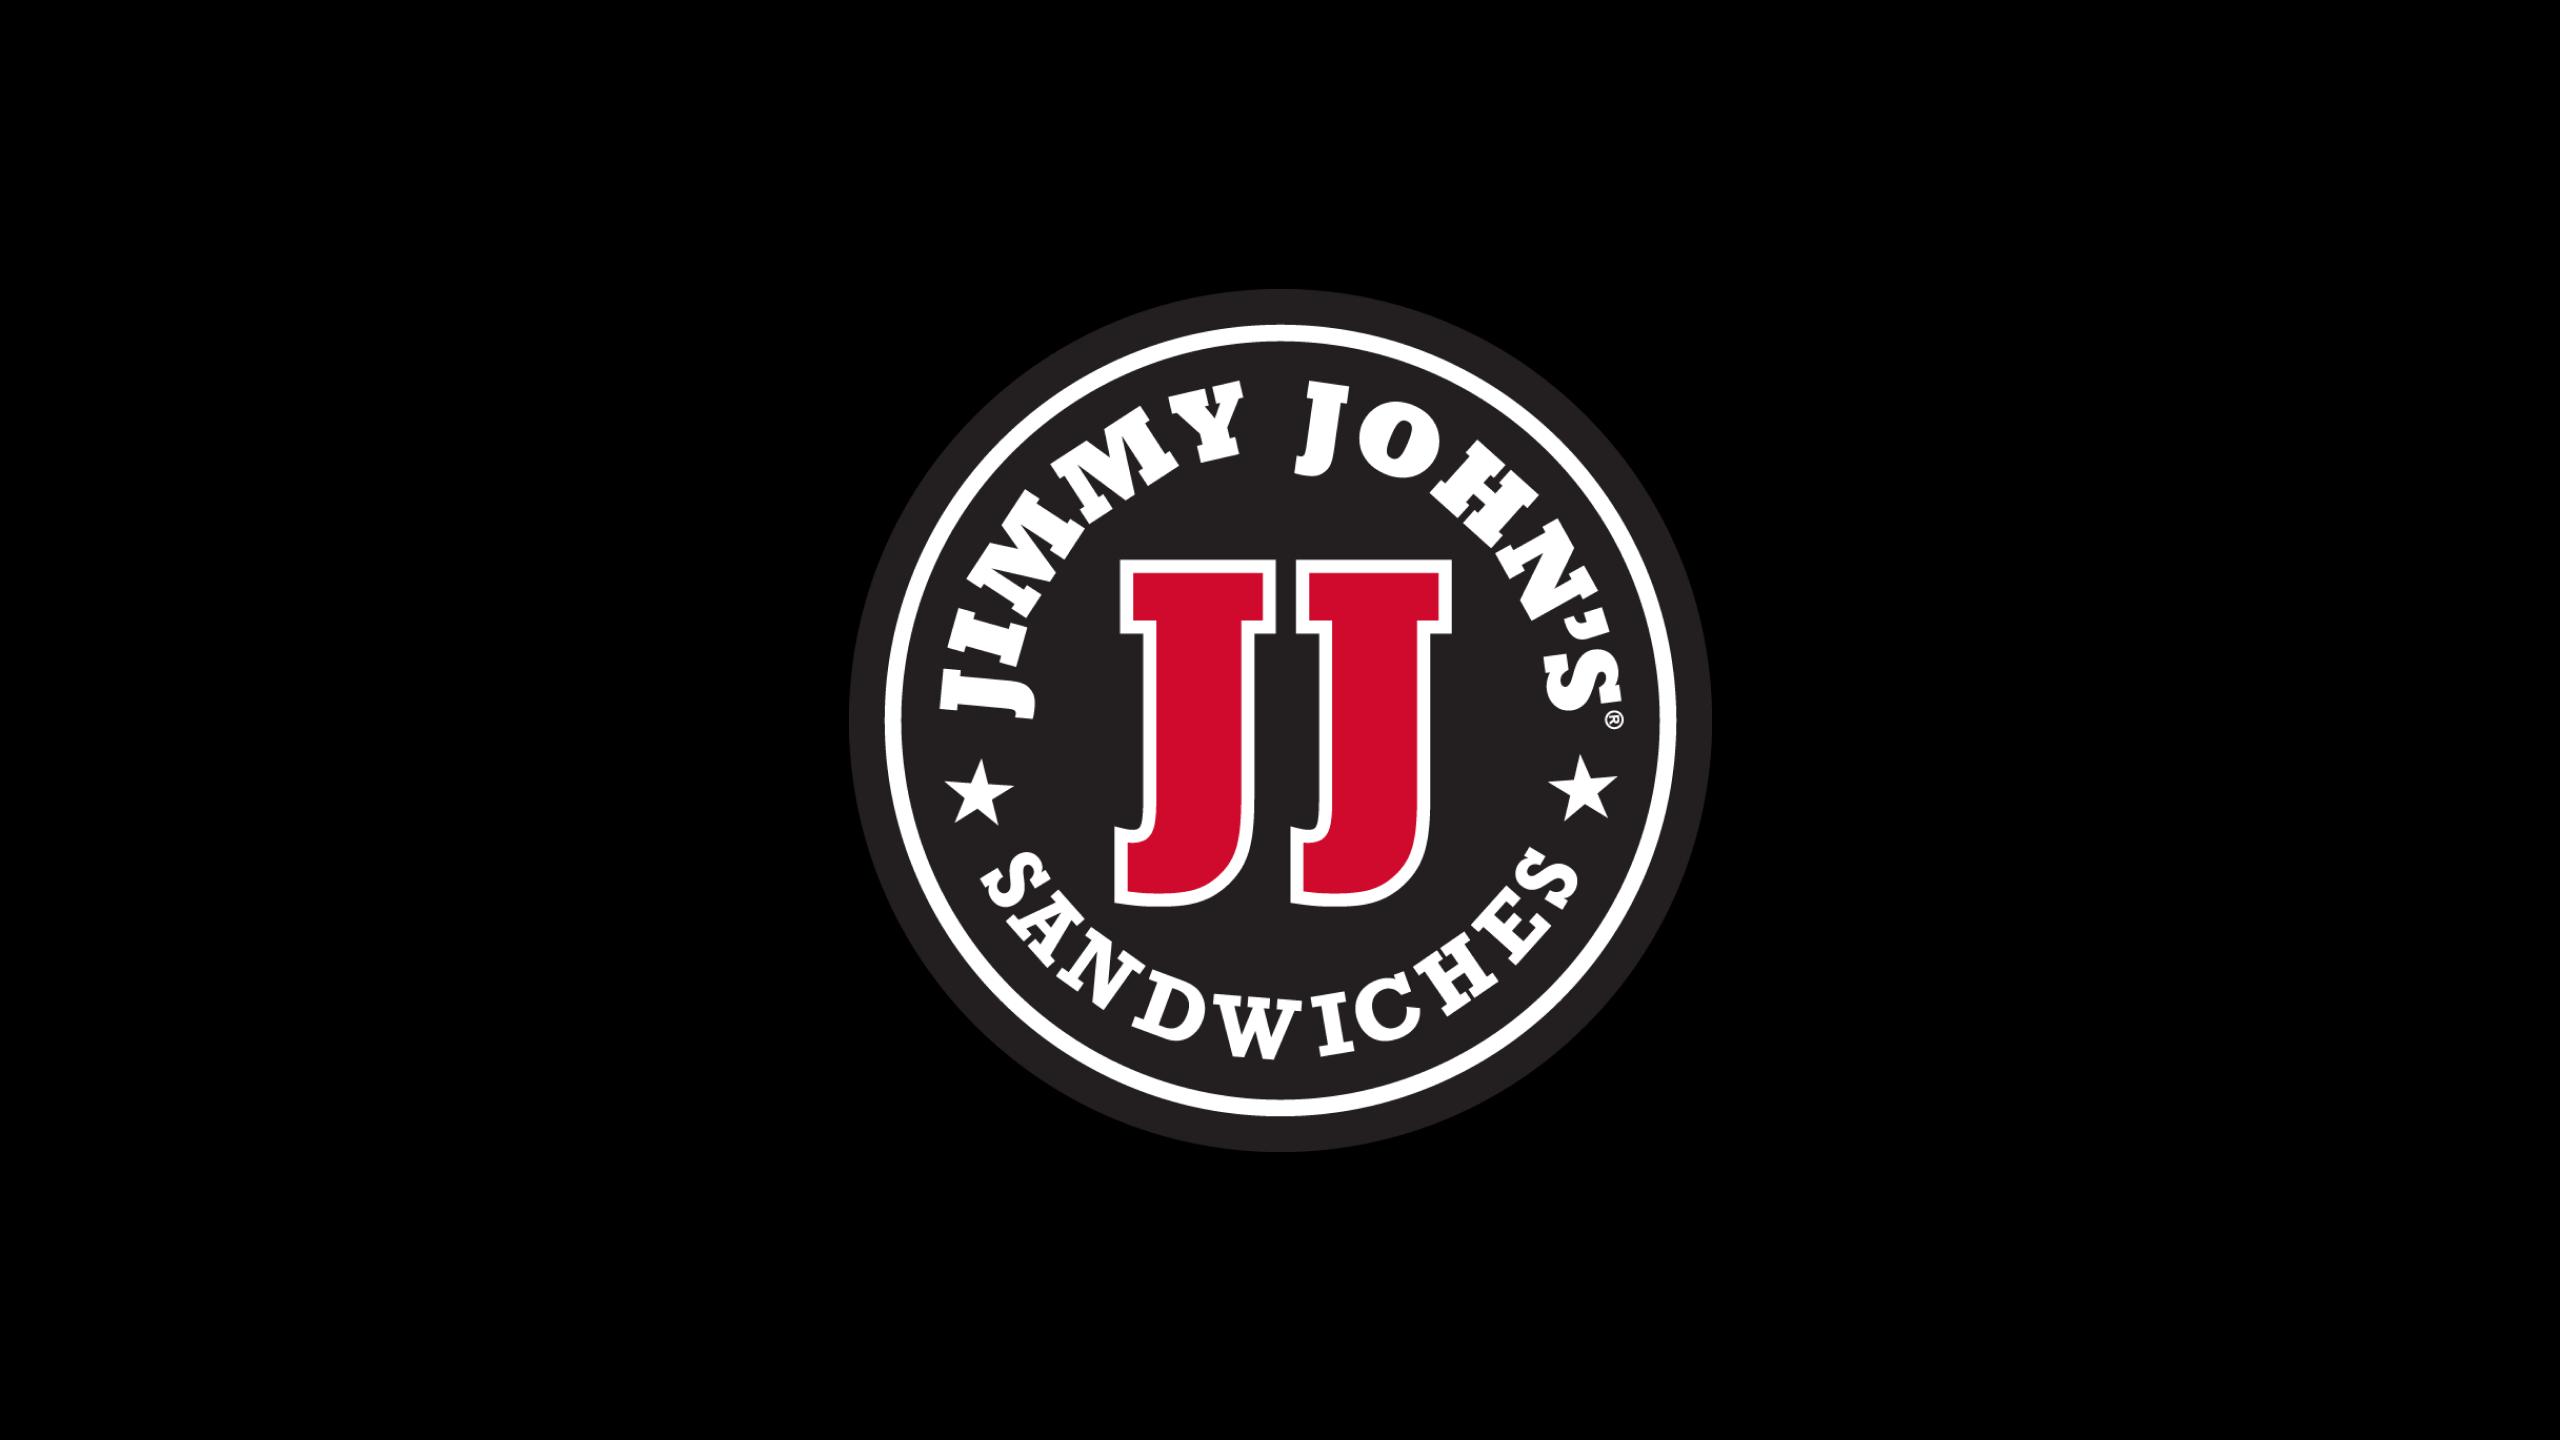 feedback-friday-jimmy-johns